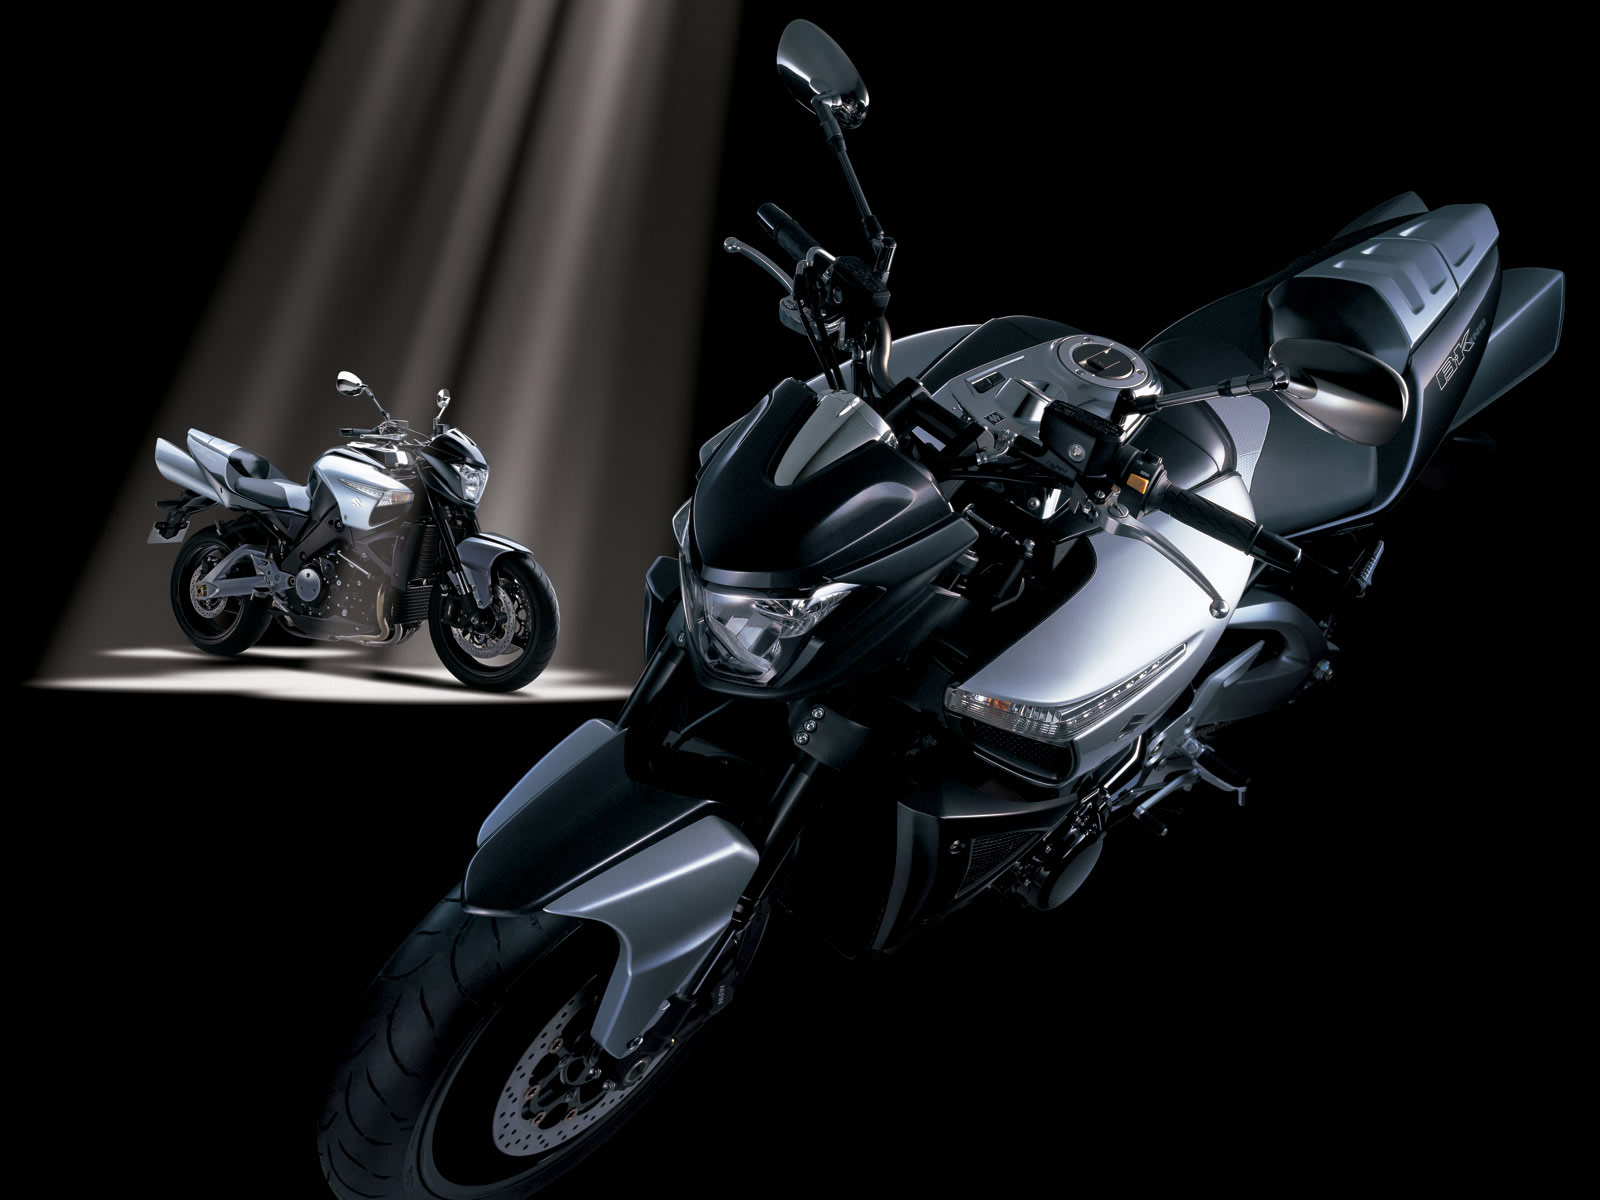 http://2.bp.blogspot.com/-dn8rpWq6B7k/TpzglNgM7bI/AAAAAAAACTs/hV0FXtqKiik/s1600/suzuki_B-King_2008_motorcycle-desktop-wallpaper_05.jpg